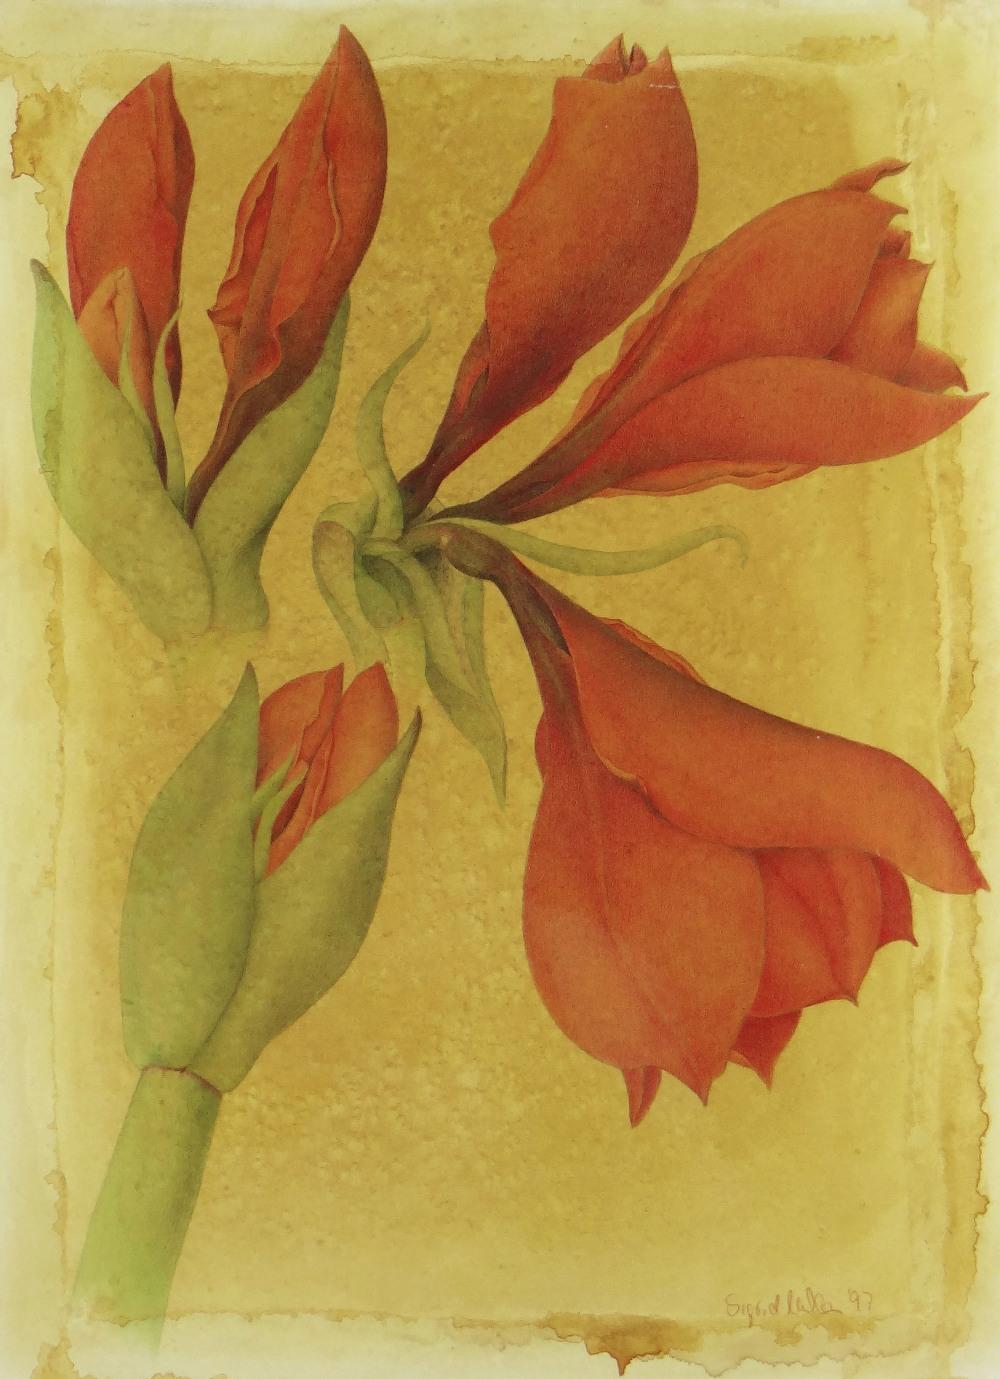 SIGRID MULLER mixed media - entitled verso on Attic Gallery Swansea label 'Amaryllis Study', signed, - Image 2 of 5